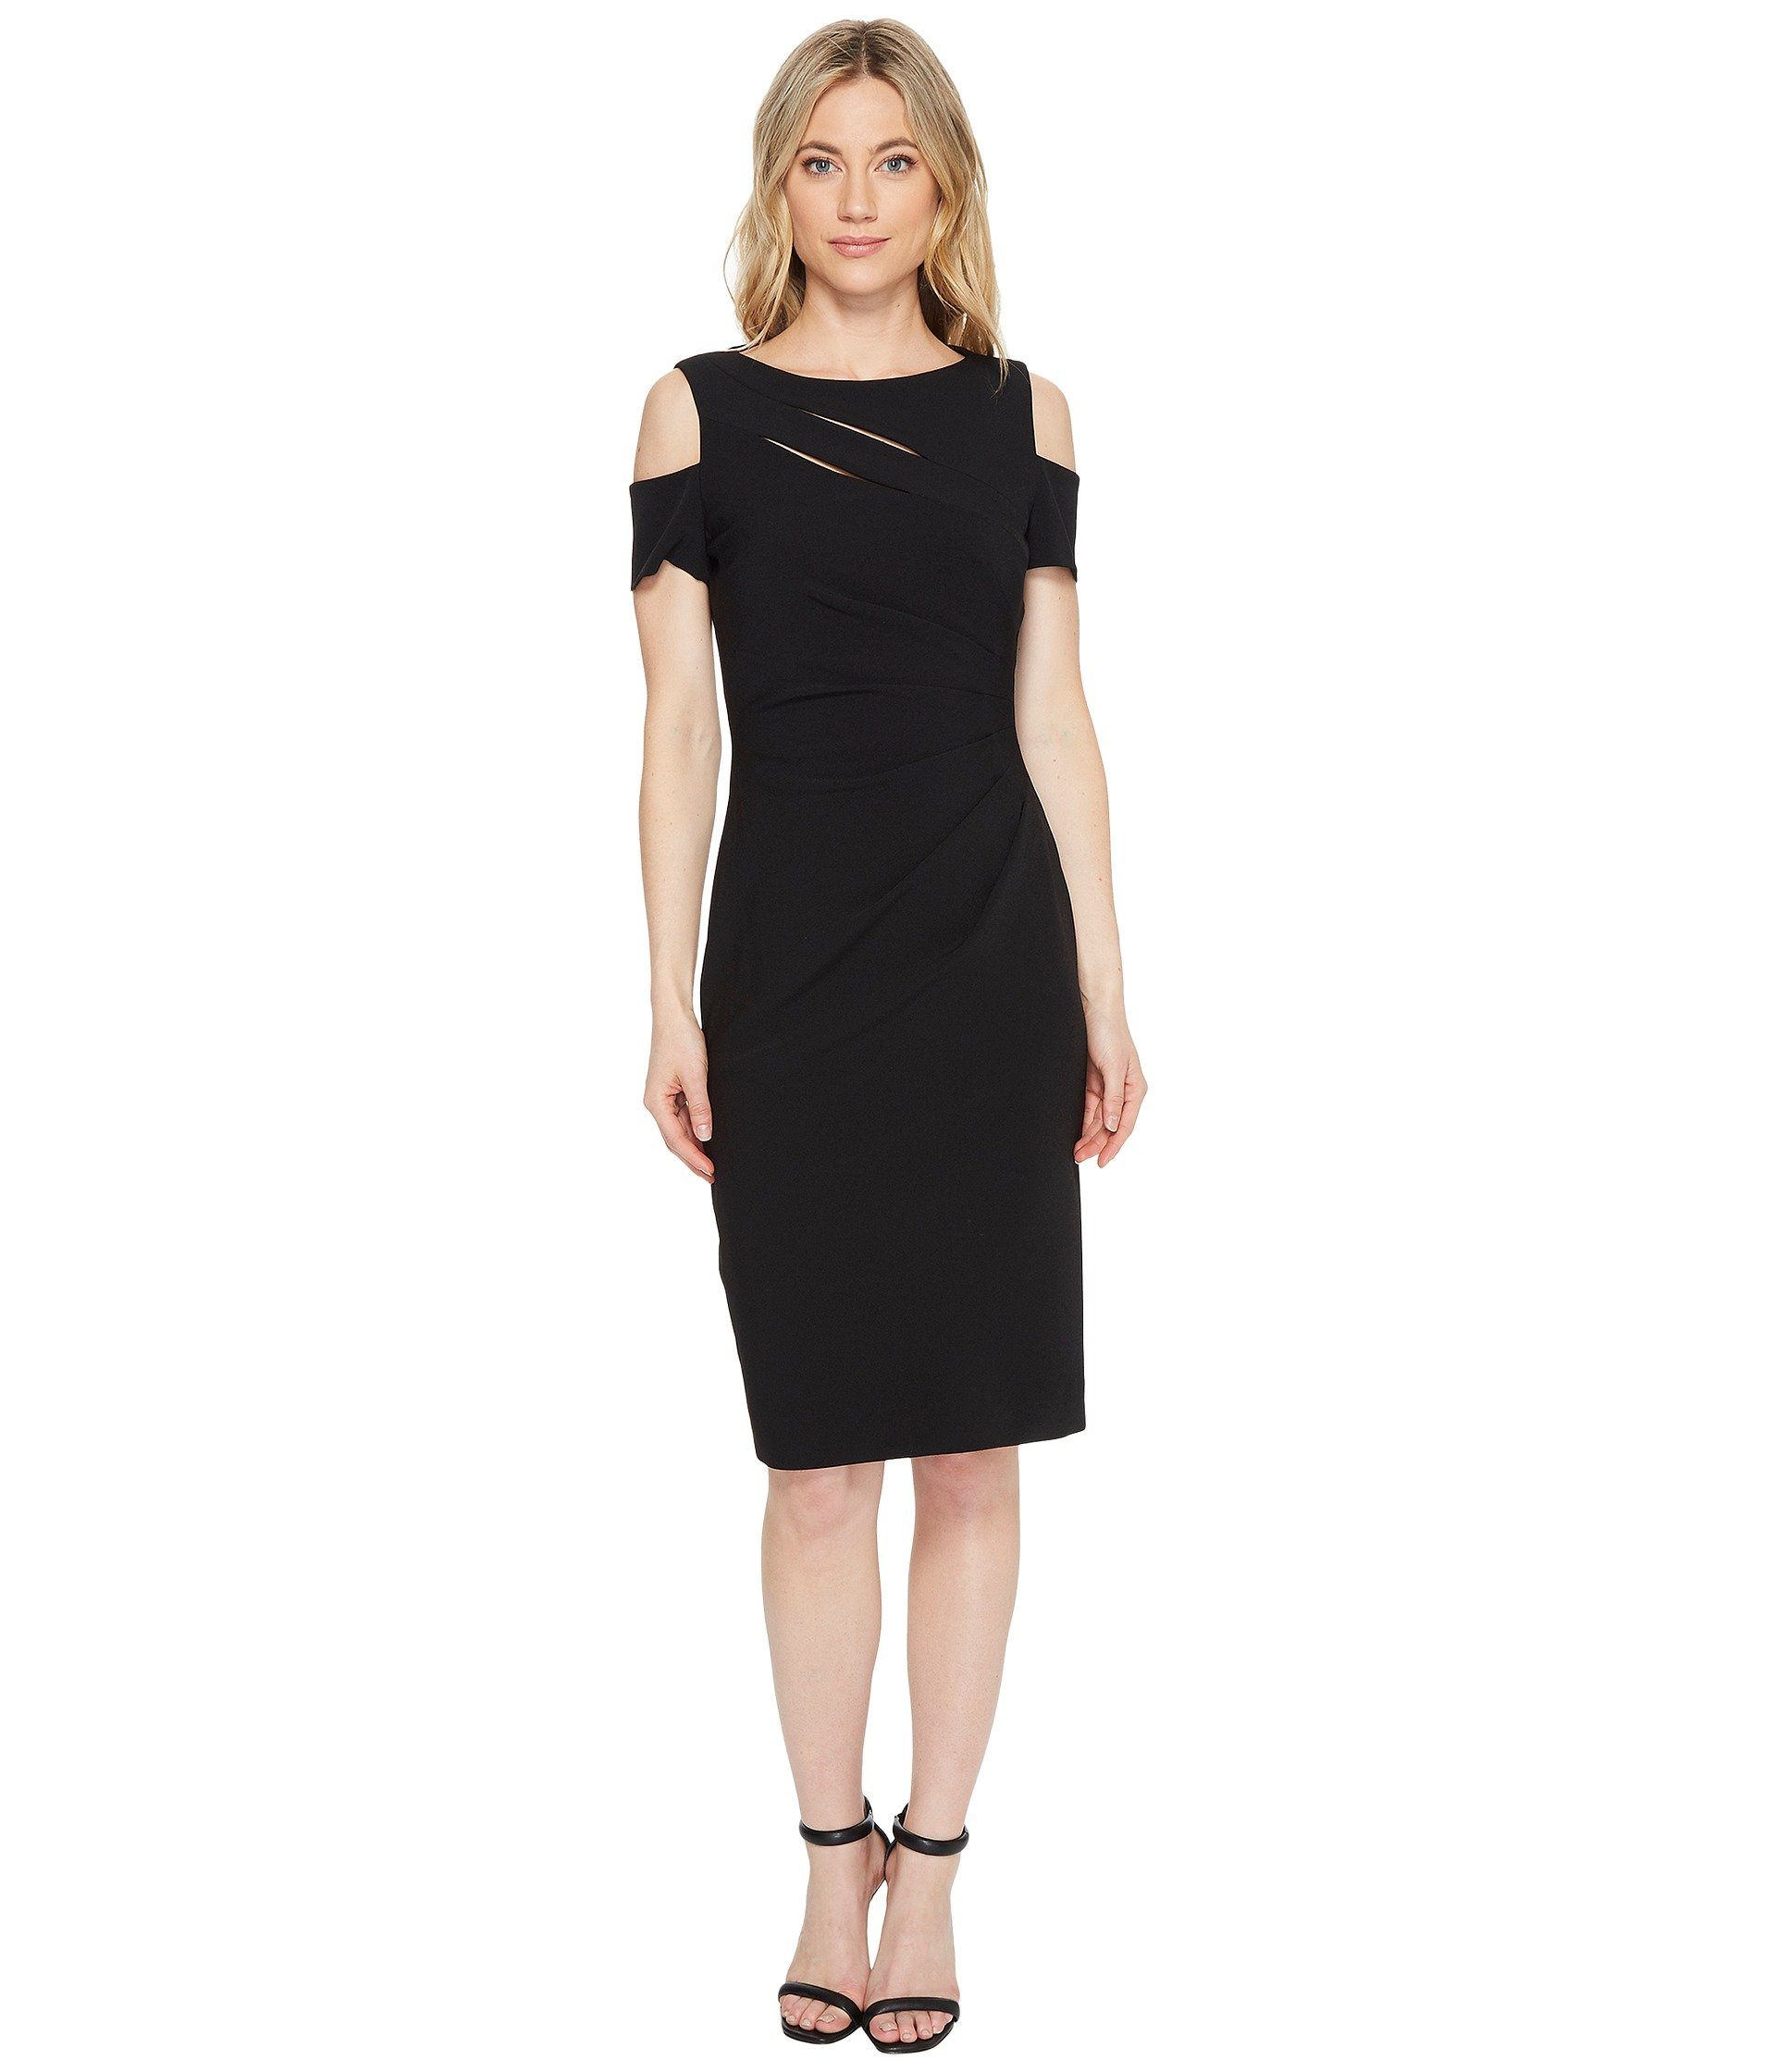 Mariu sequin shift dress in black